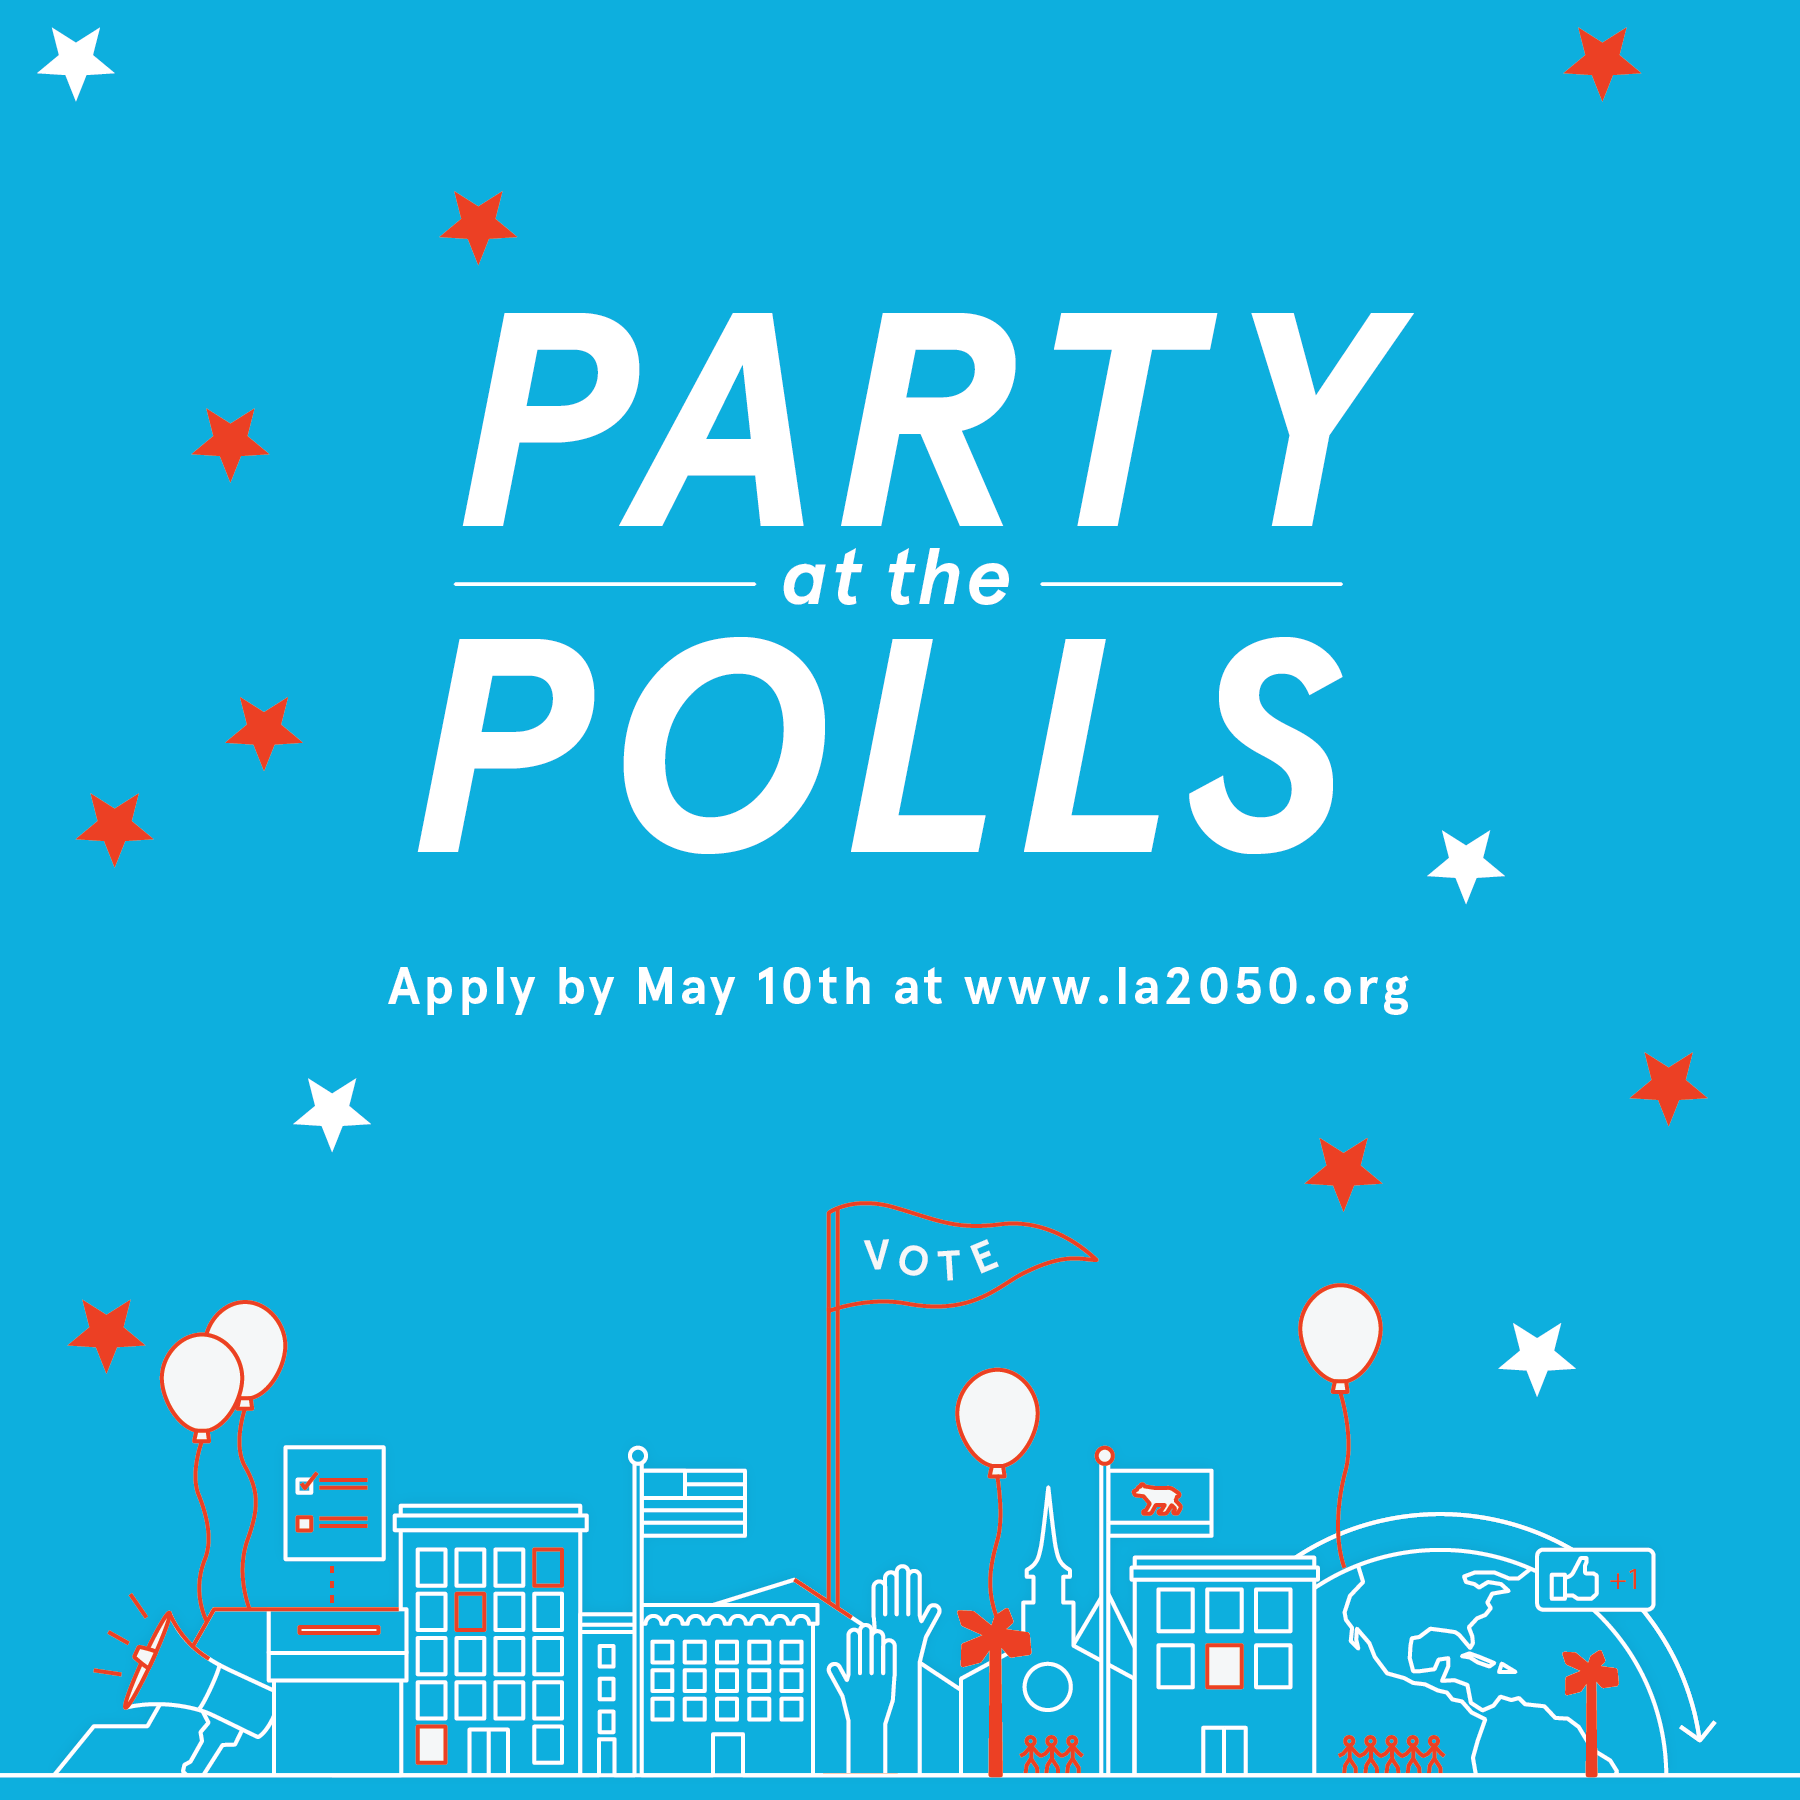 #PartyatthePolls